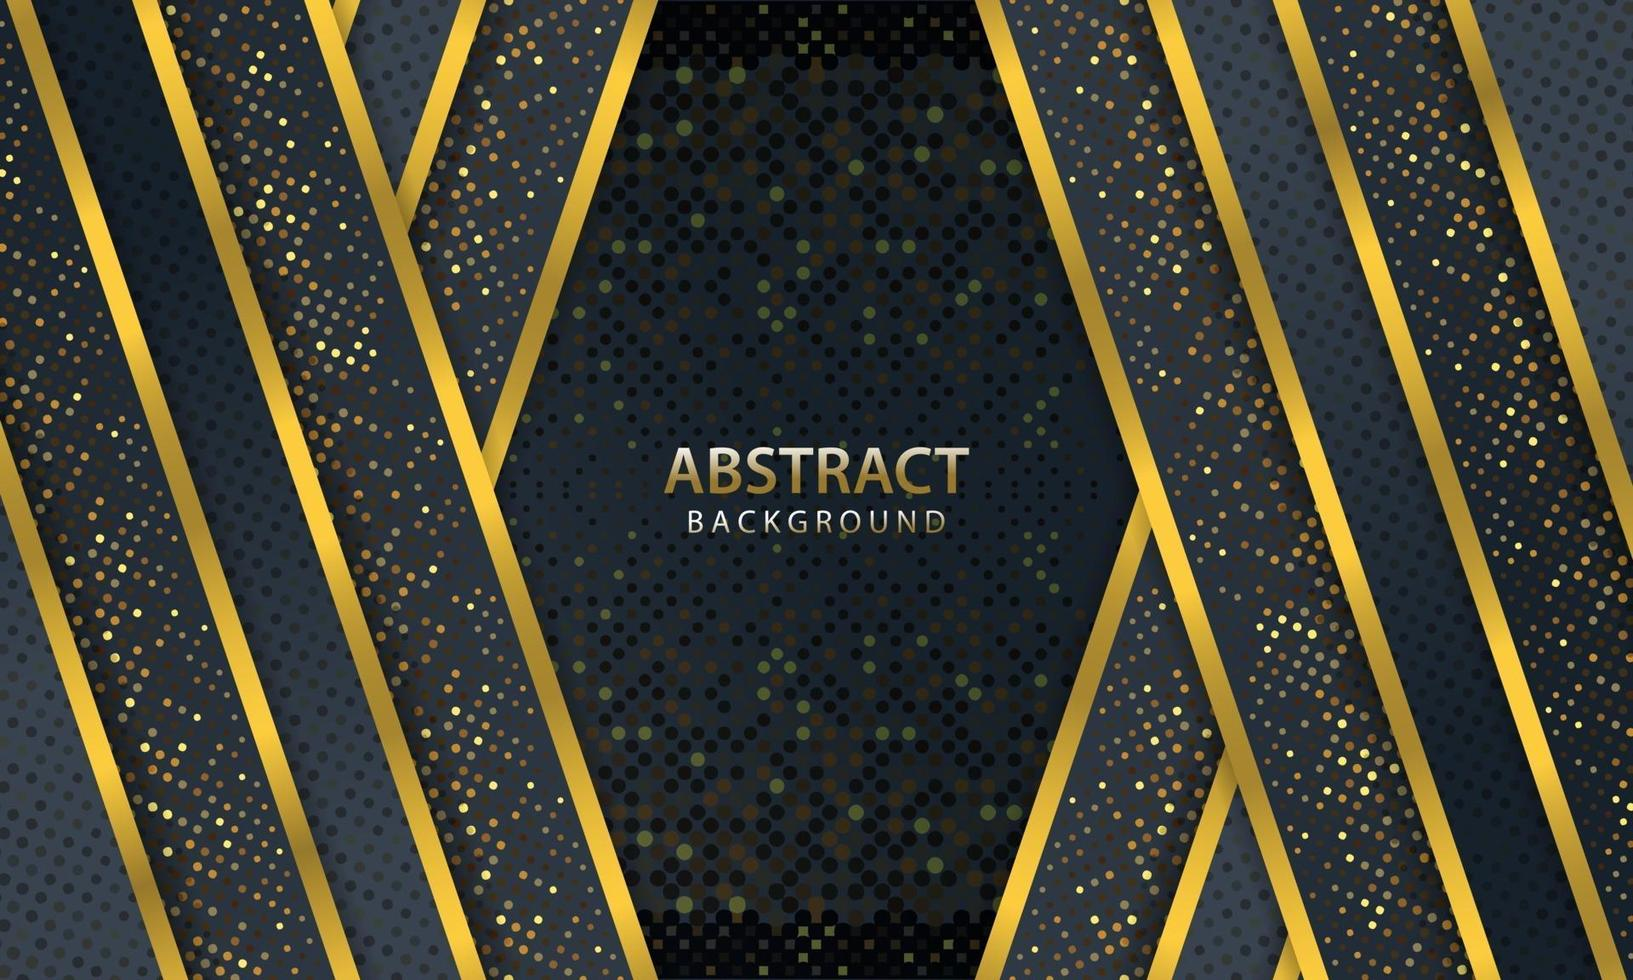 abstrakt mörk bakgrund med guldlinje design modern. vektor illustration.